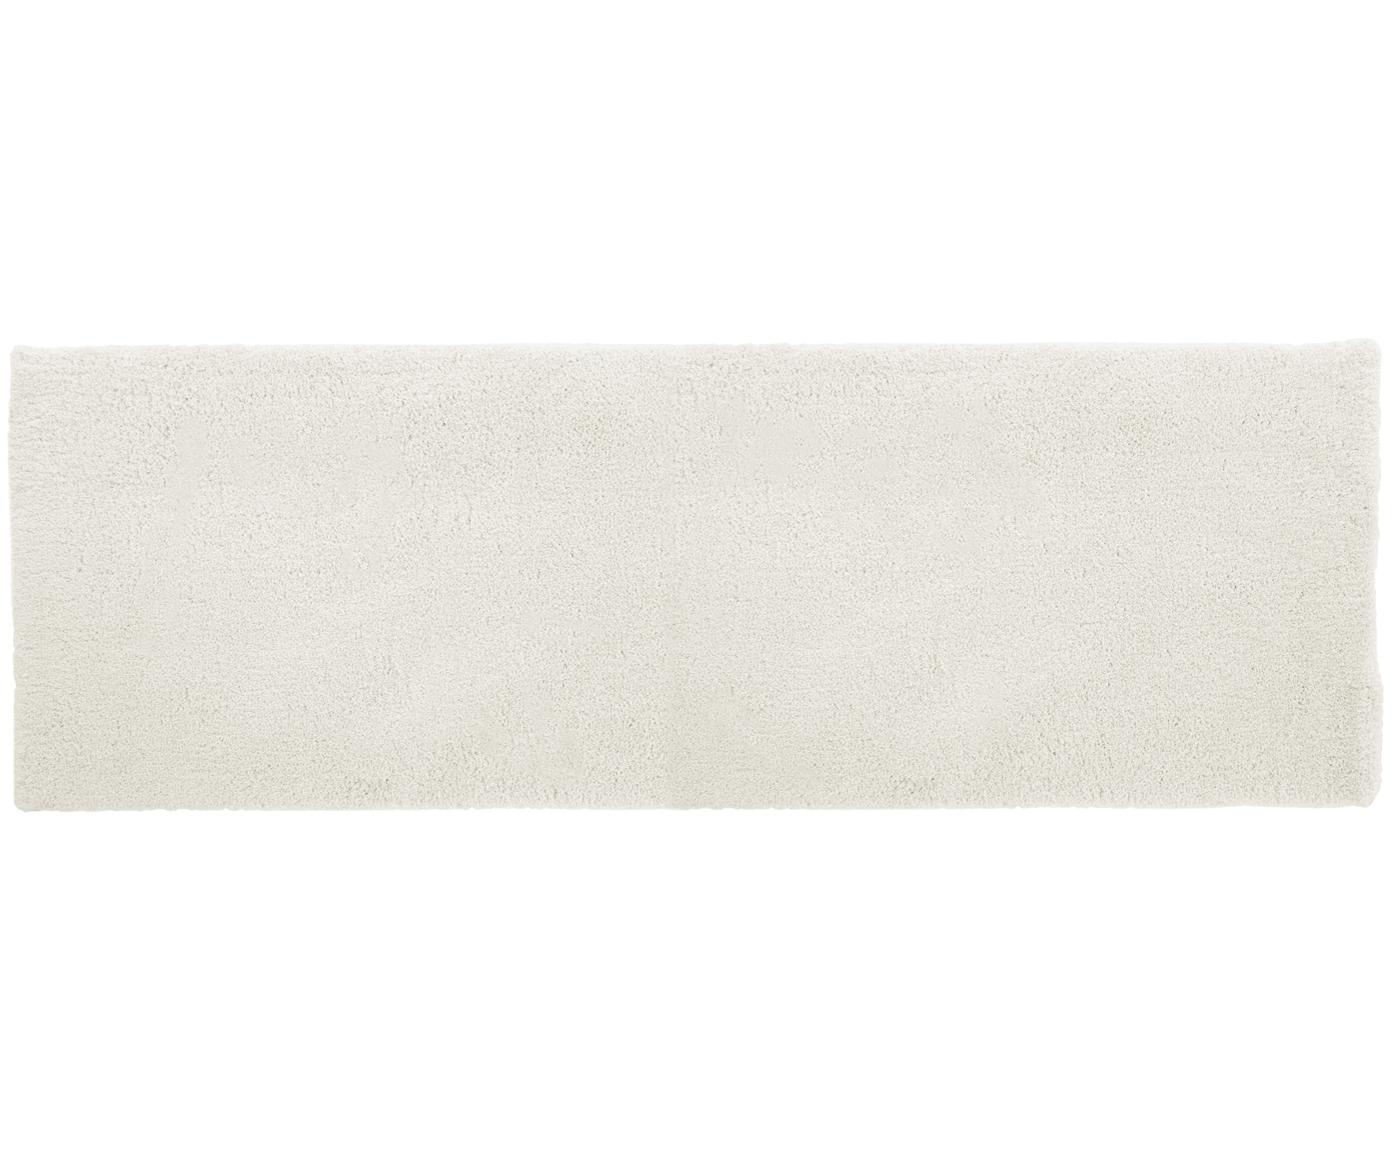 Passatoia pelosa morbida color crema Leighton, Retro: 100% poliestere, Crema, Larg. 80 x Lung. 250 cm